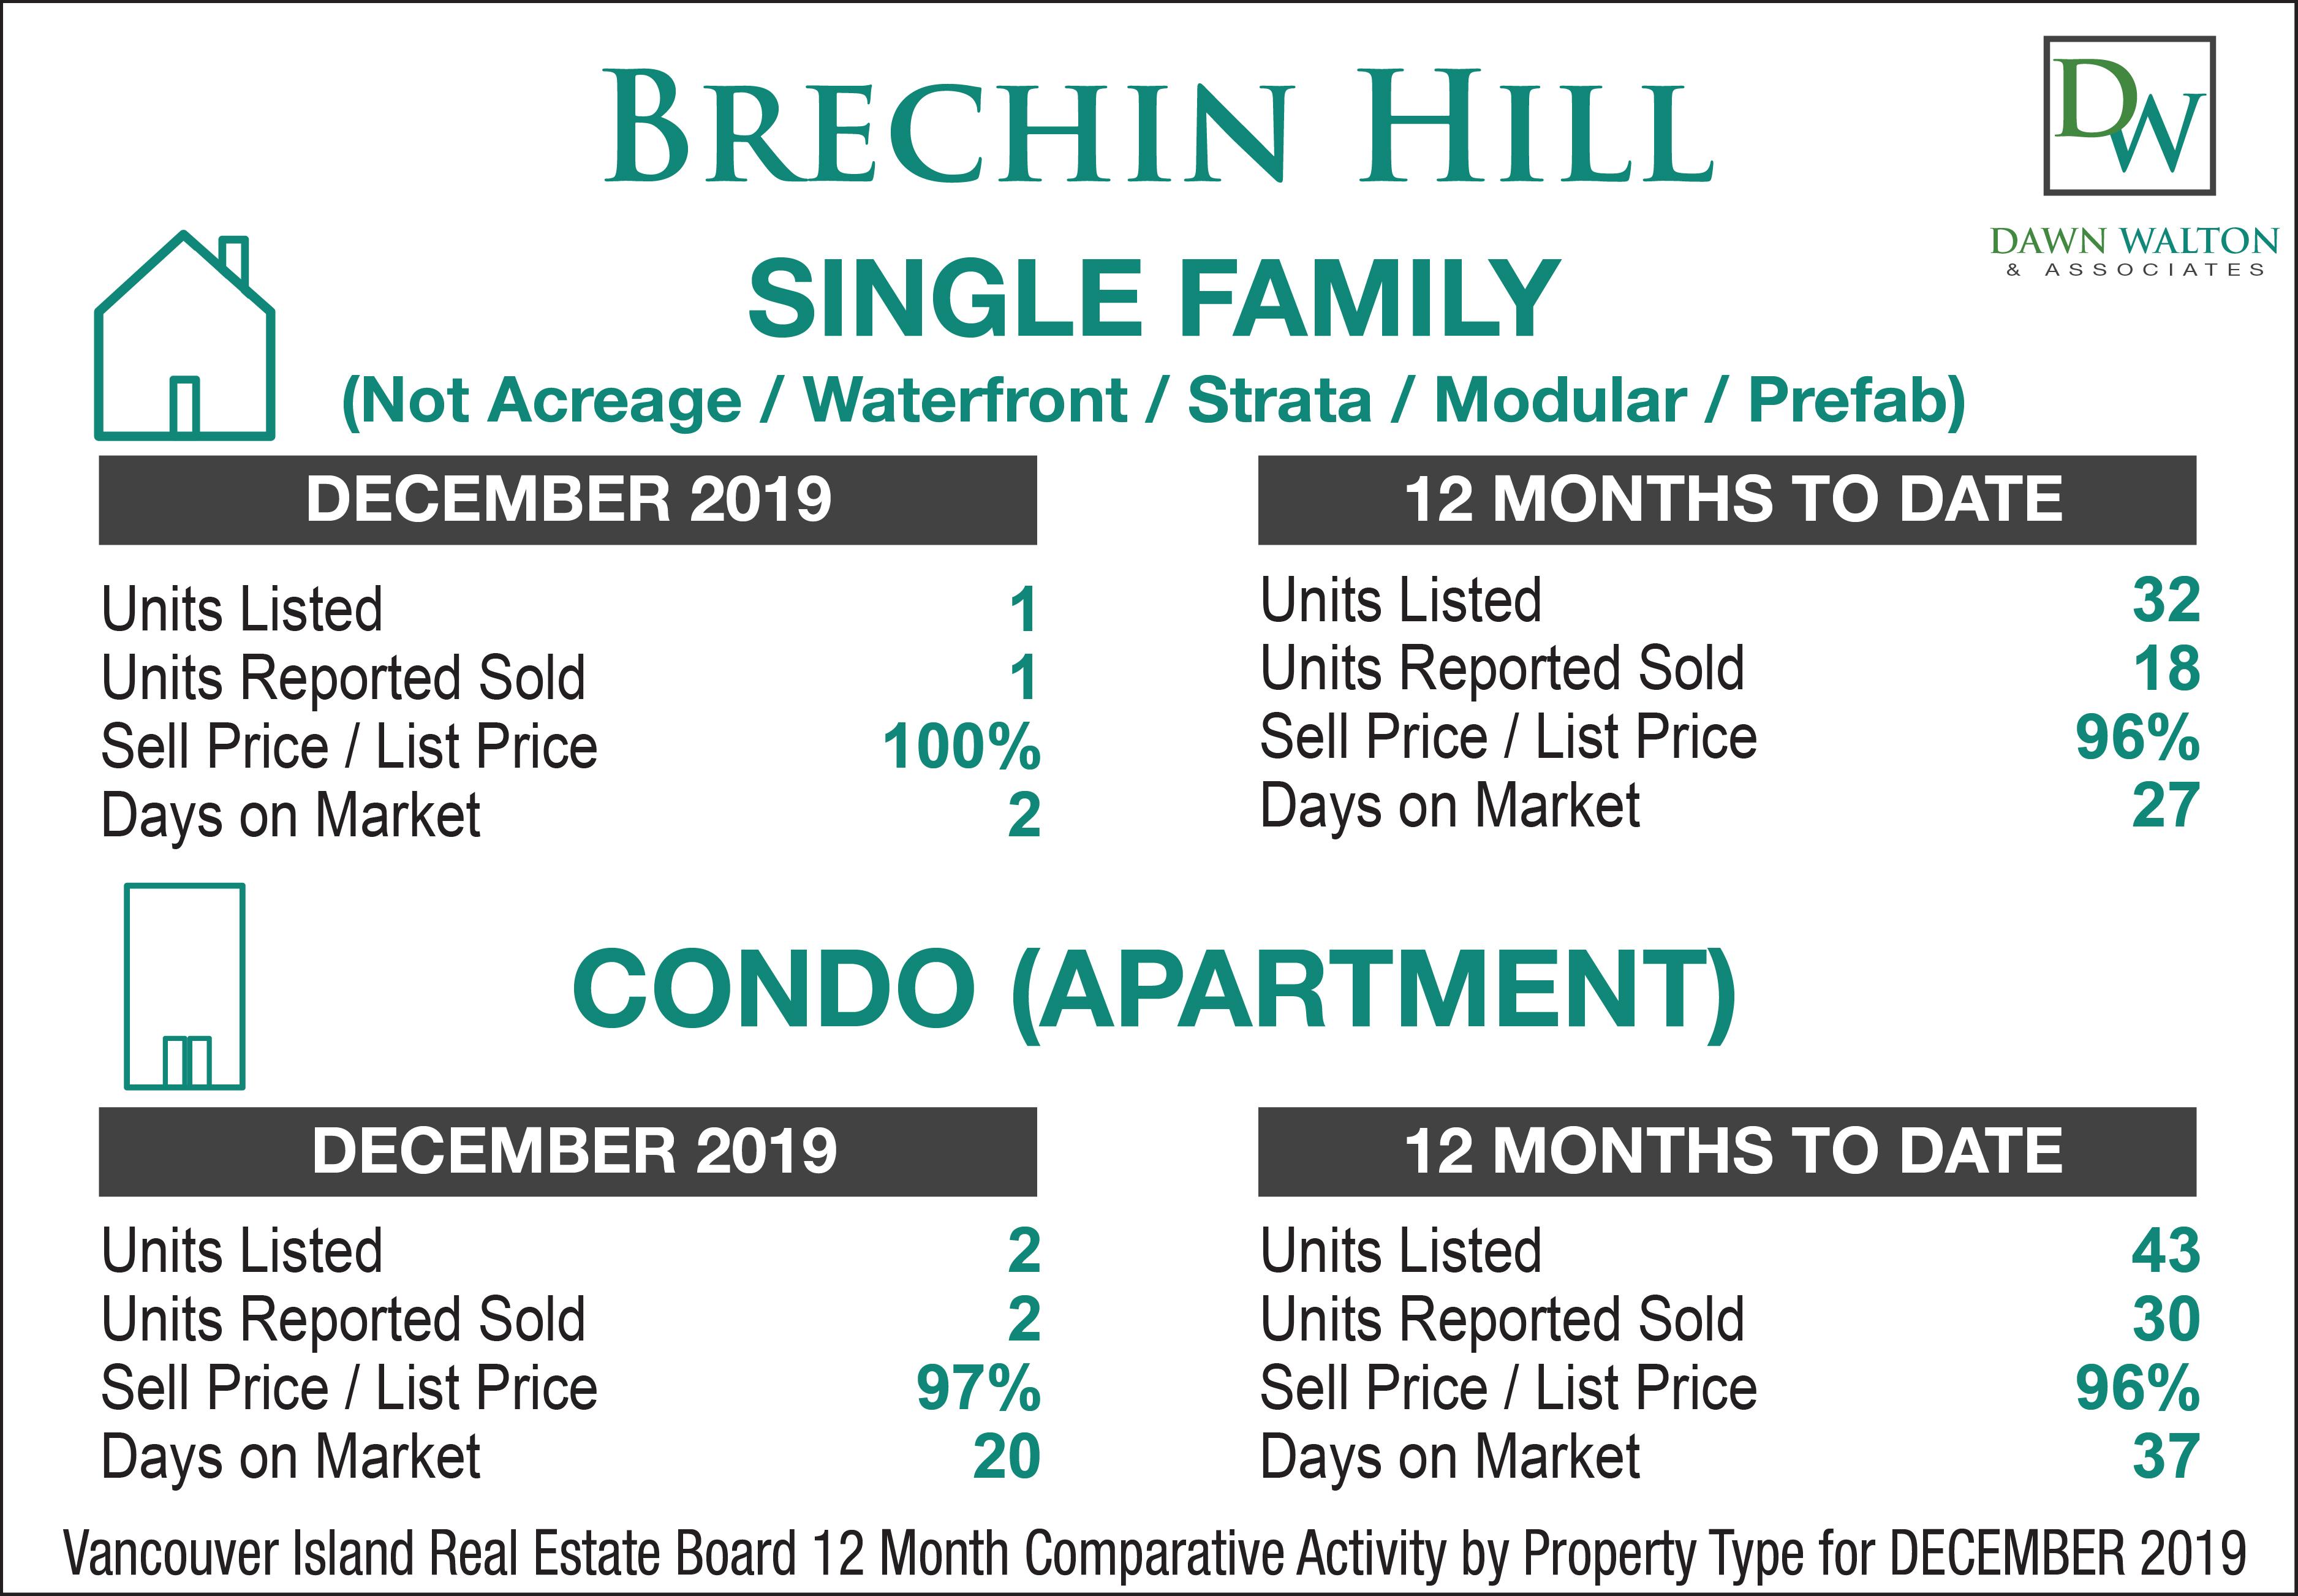 Brechin Hill Real Estate Market Stats December  2019 - Nanaimo Realtor Dawn Walton